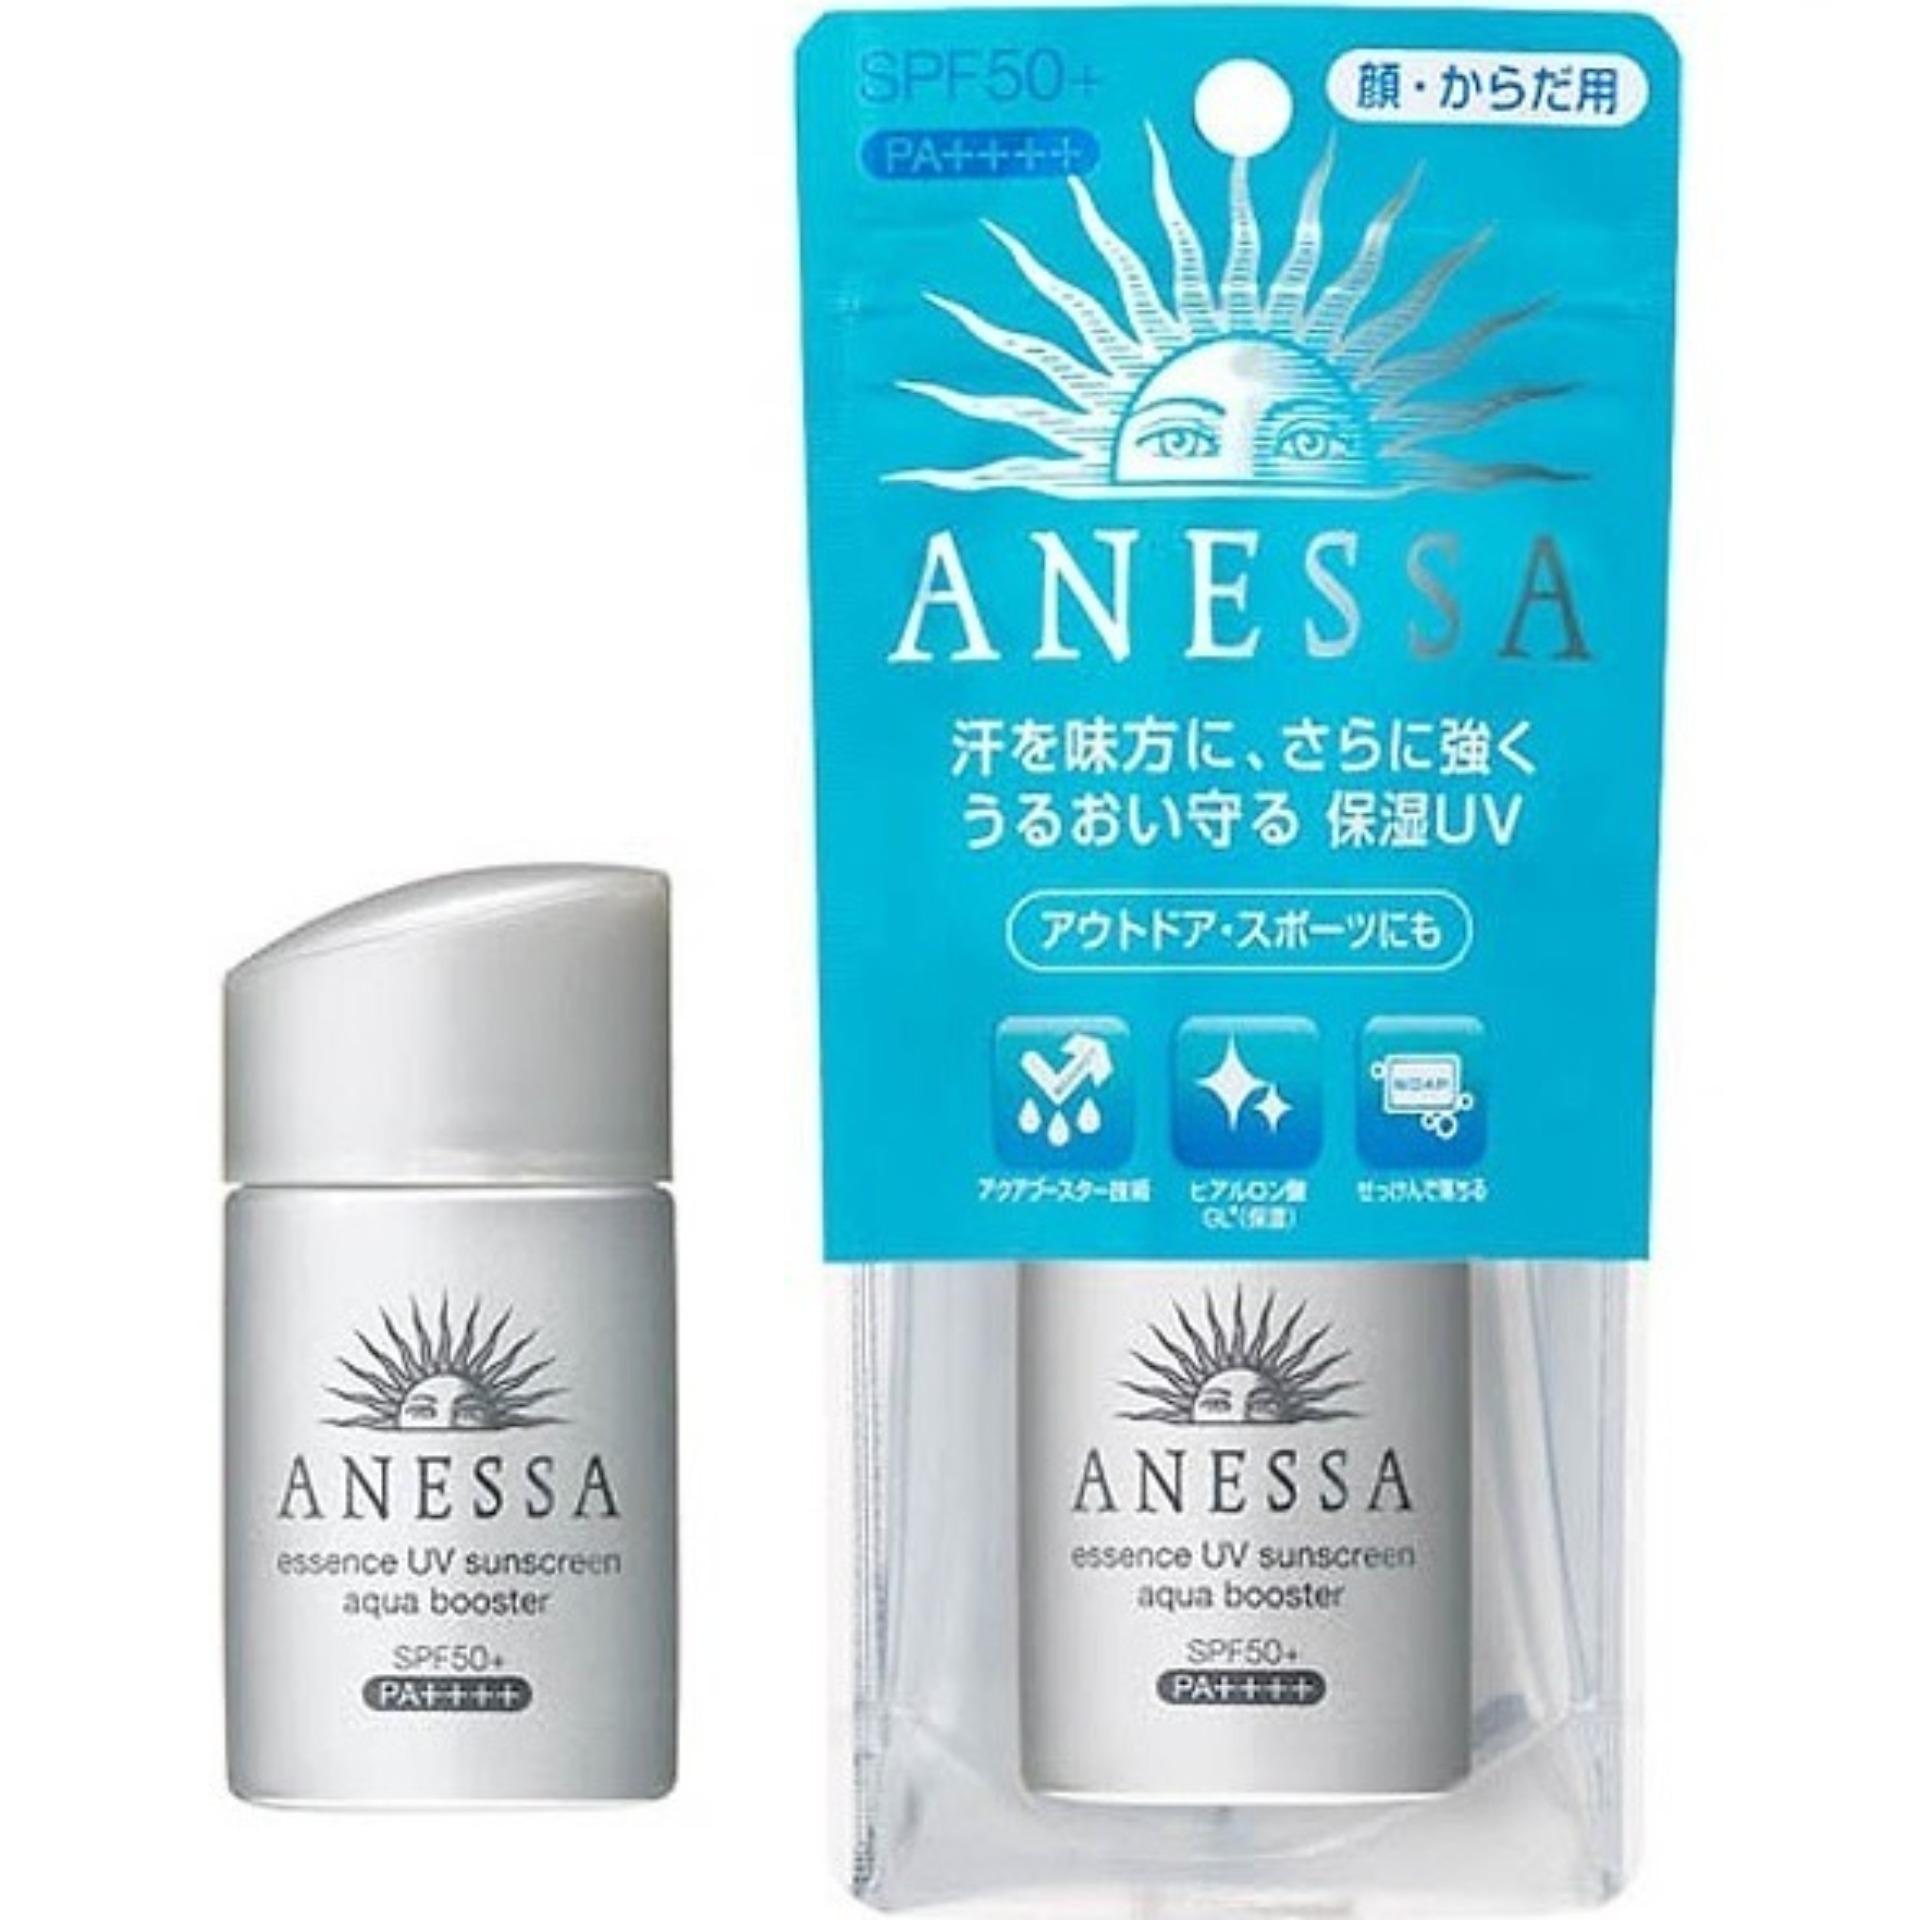 Kem Chống Nắng Shiseid0 Anessa Essence UV Sunscreen Aqua Booster Mini 25ml tốt nhất